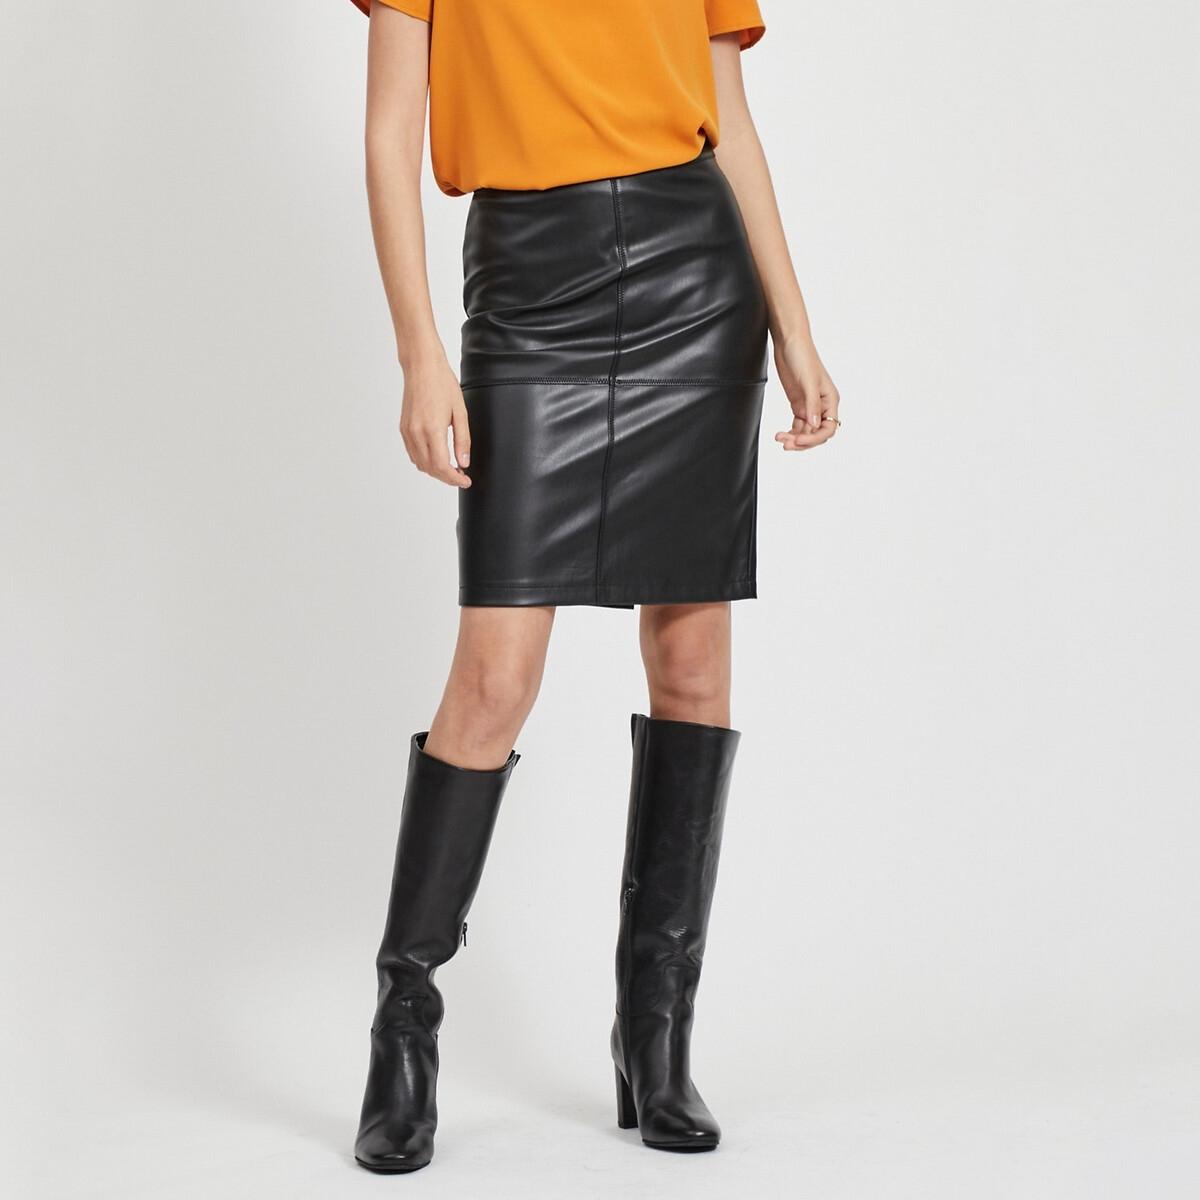 Юбка-карандаш La Redoute С разрезом Vipen Skirt S черный